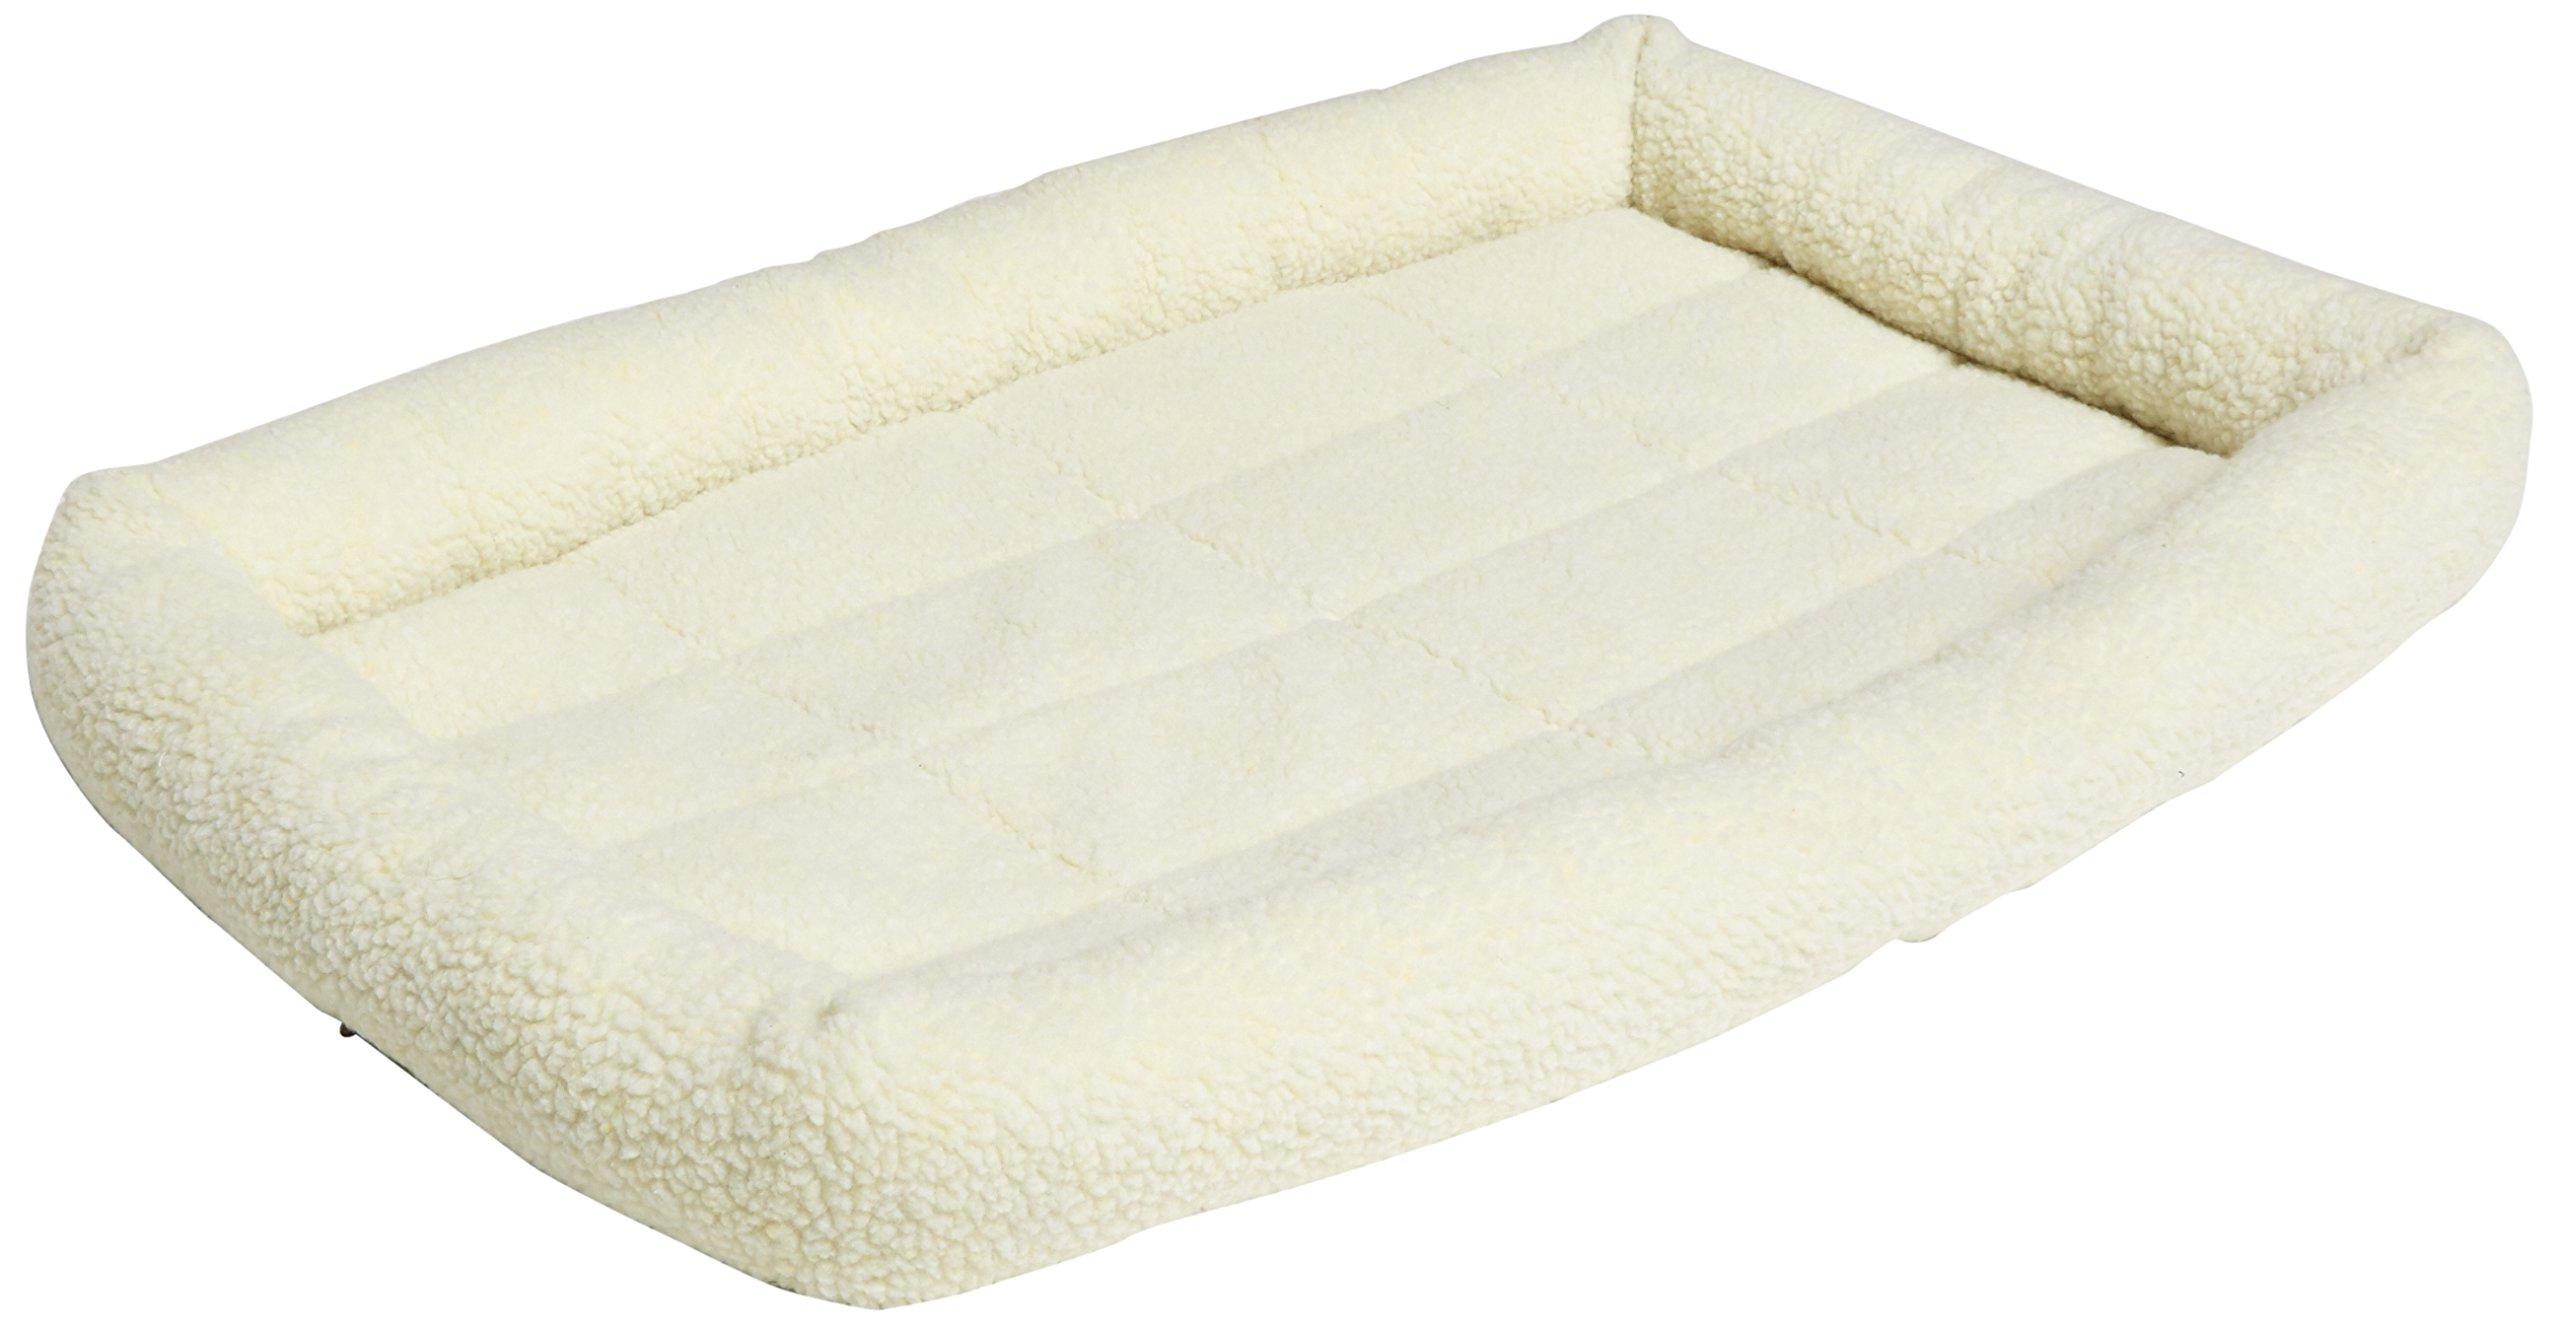 AmazonBasics-Padded-Pet-Bolster-Bed-MediumLarge